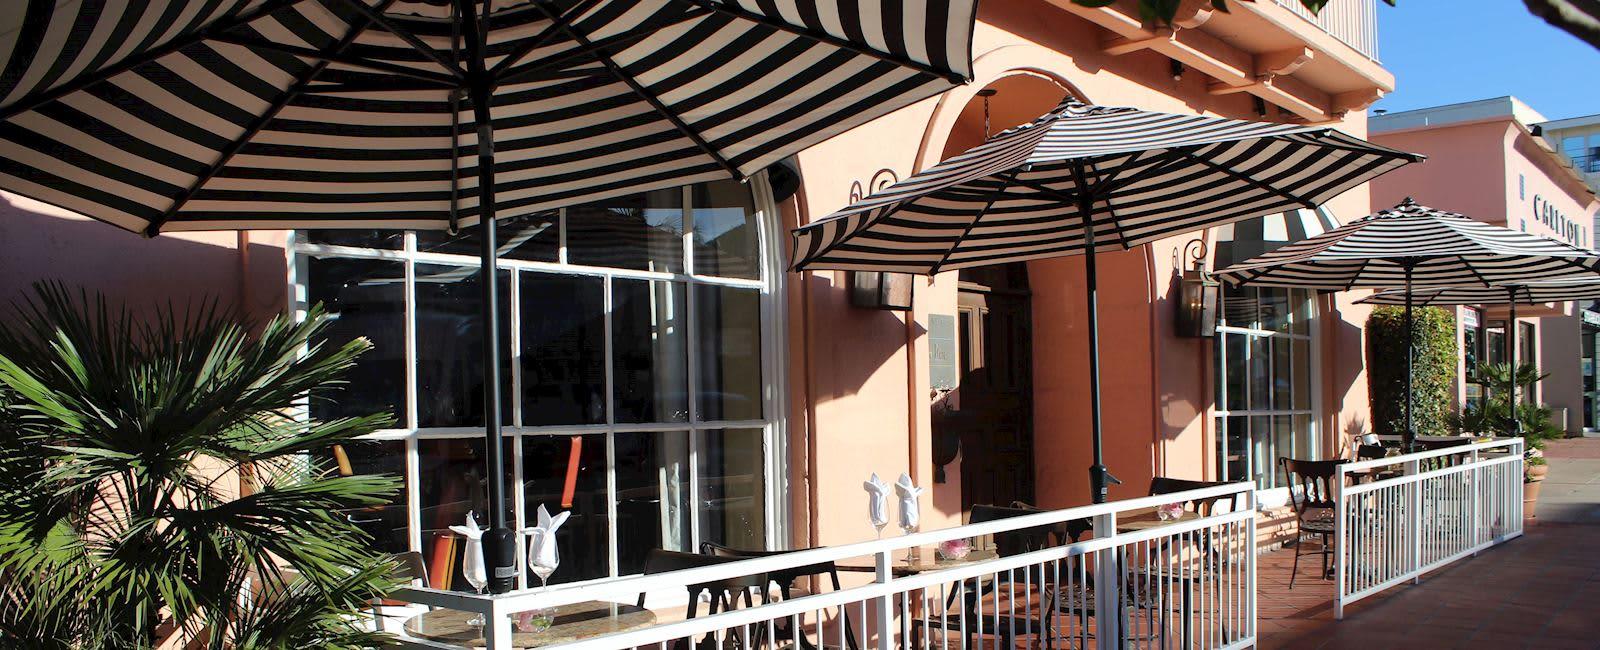 Café La Rue Dining Facilities at La Valencia Hotel and Spa California